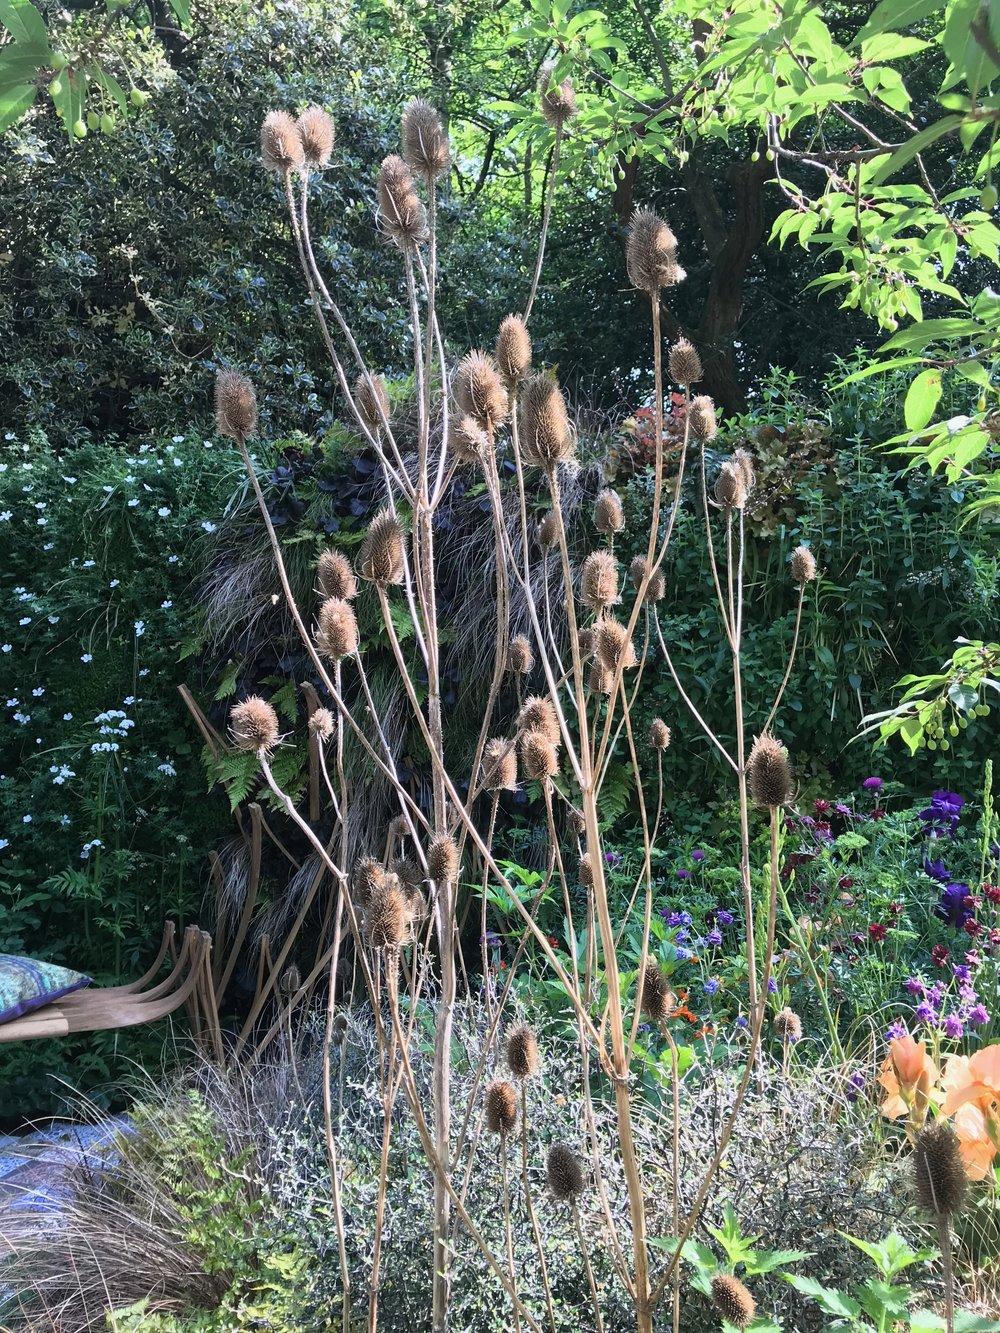 Teasel seed-heads in Kate Crome's Epilepsy garden